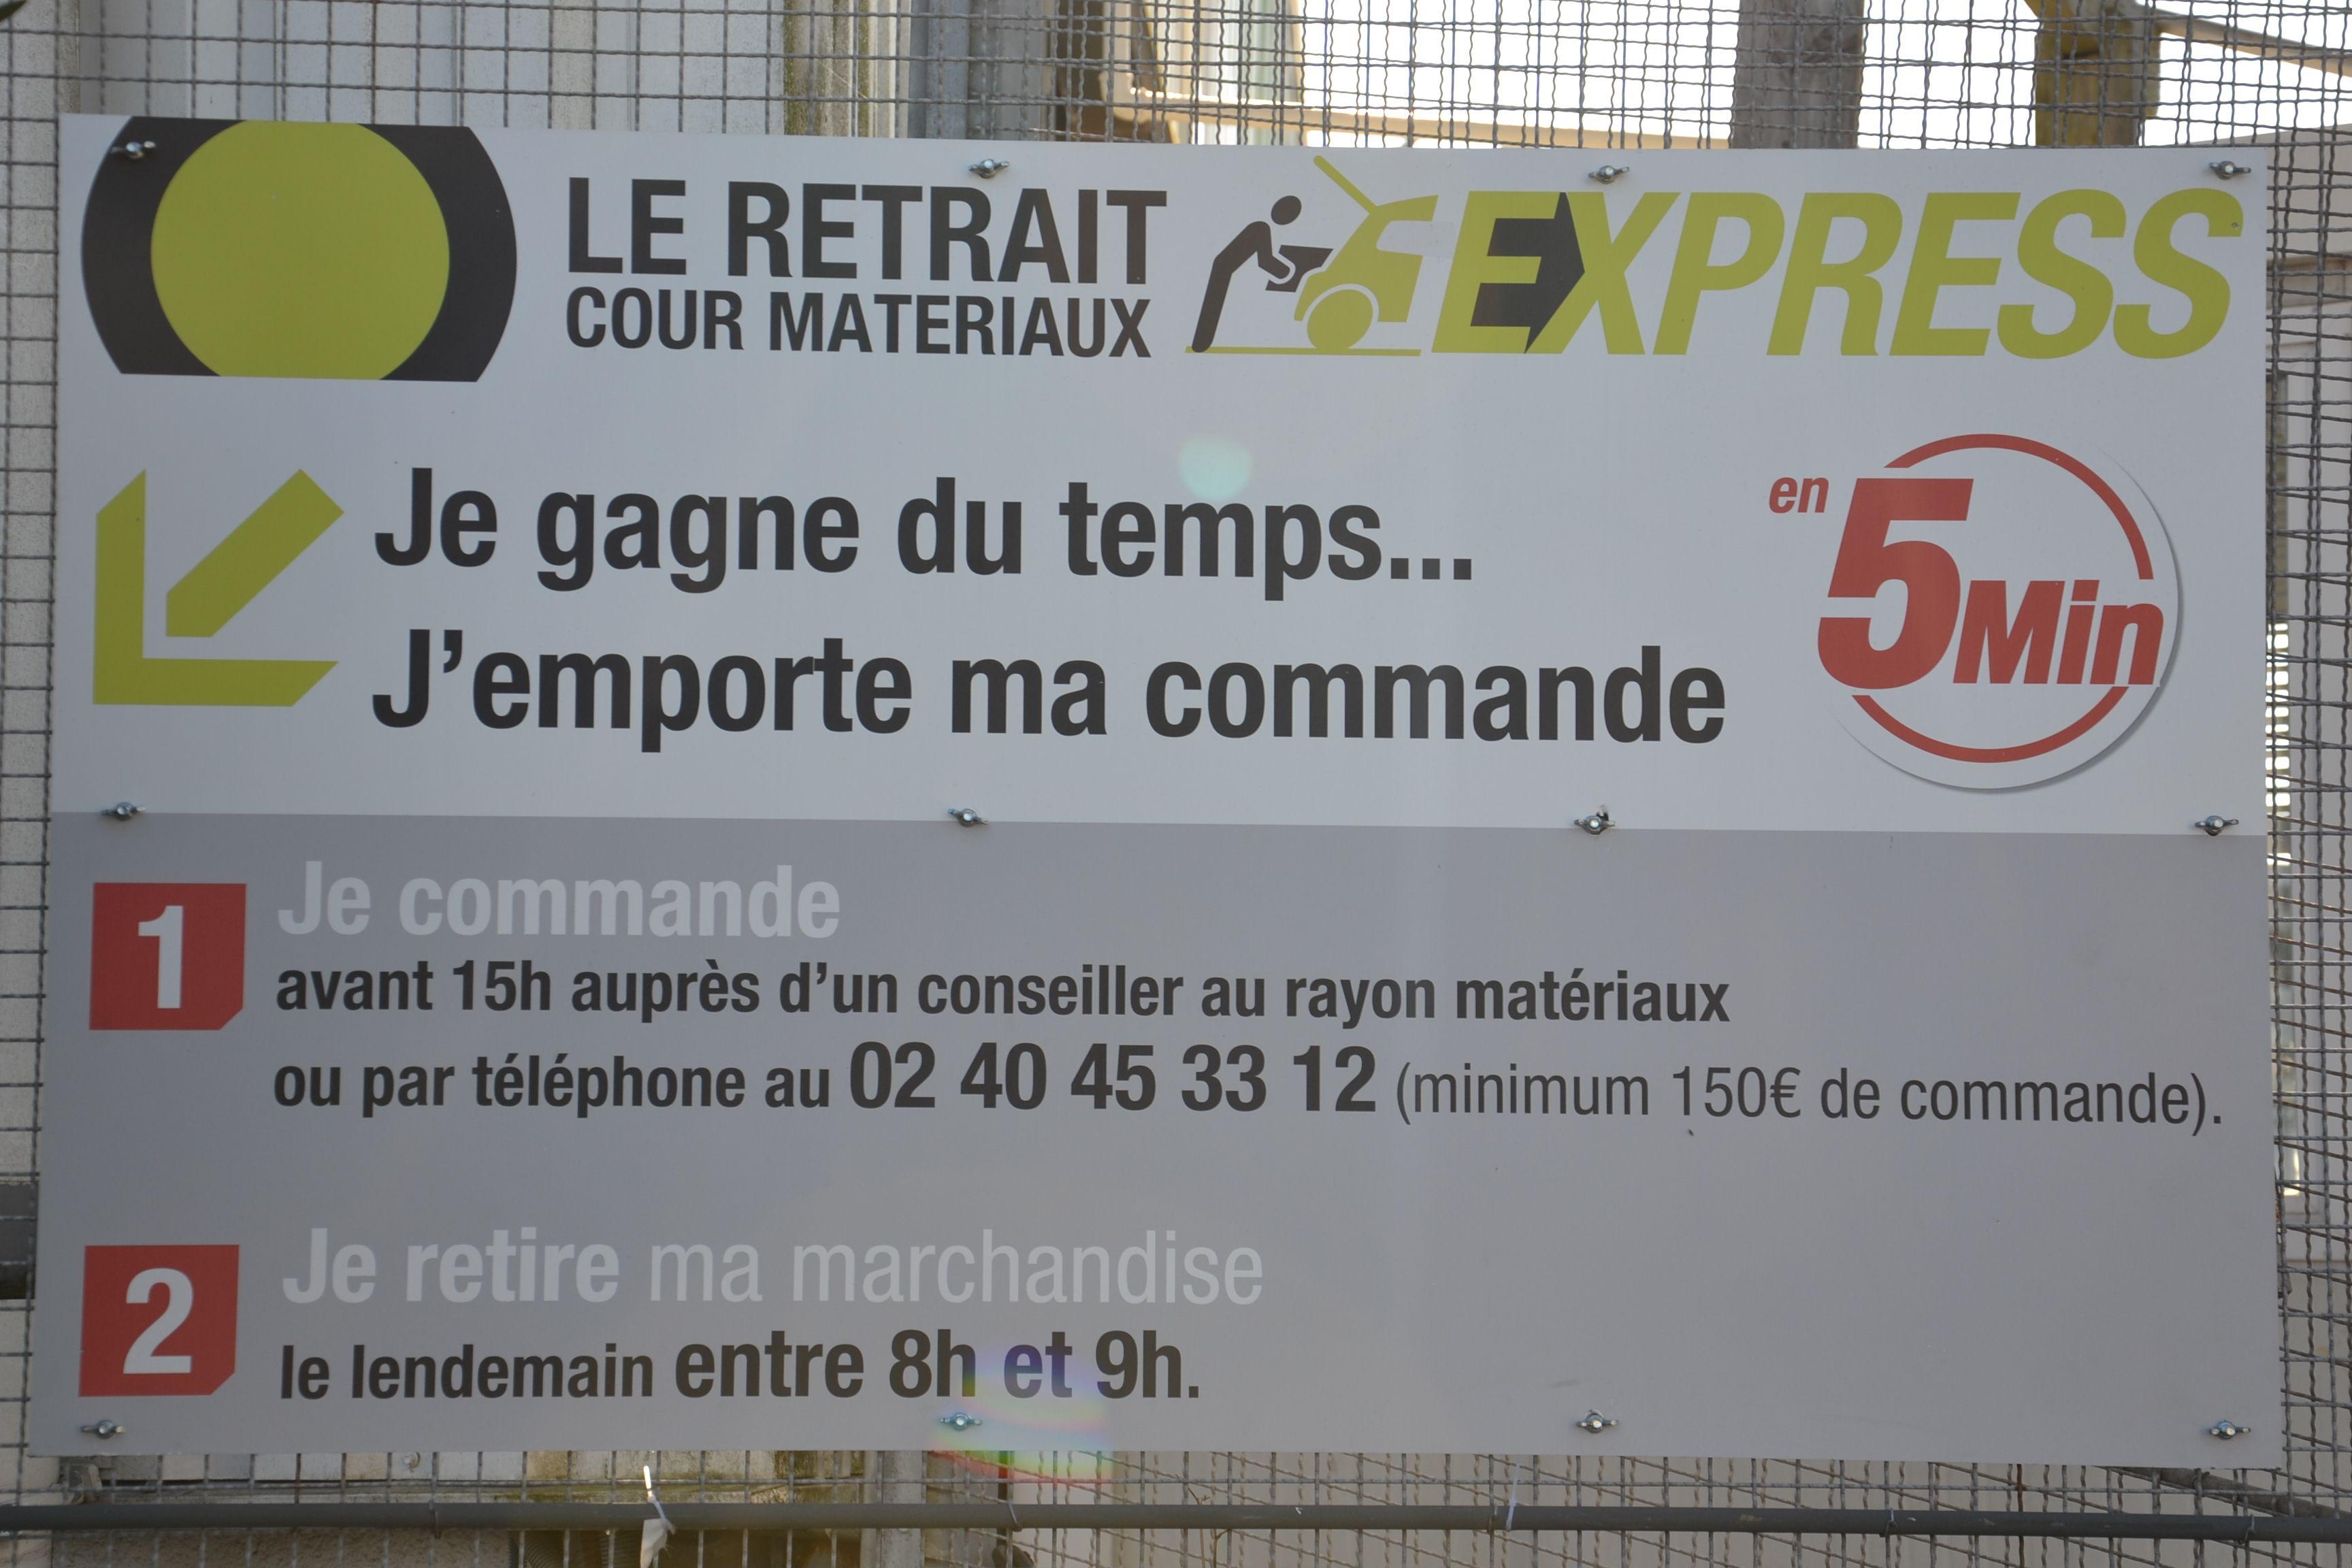 Service Retrait Commande Express Retraitcommandeexpress Equipe Magasin Leroymerlintrignac Trignac Loirea Loire Atlantique Equipe Magasin Leroy Merlin